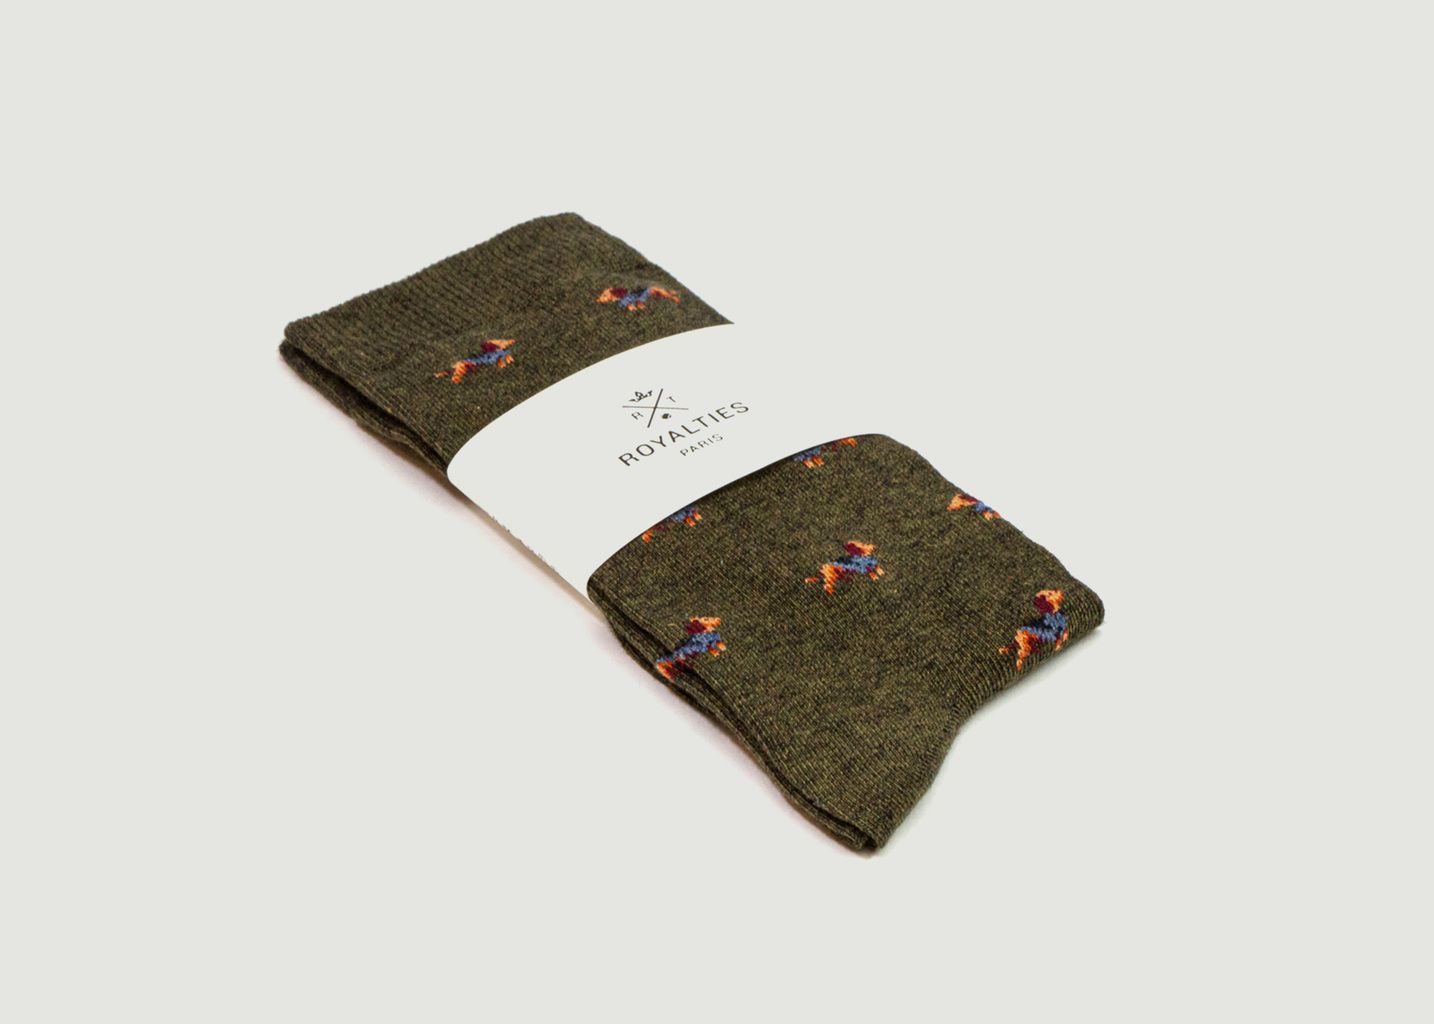 Chaussettes motif chiens Sherlock - Royalties